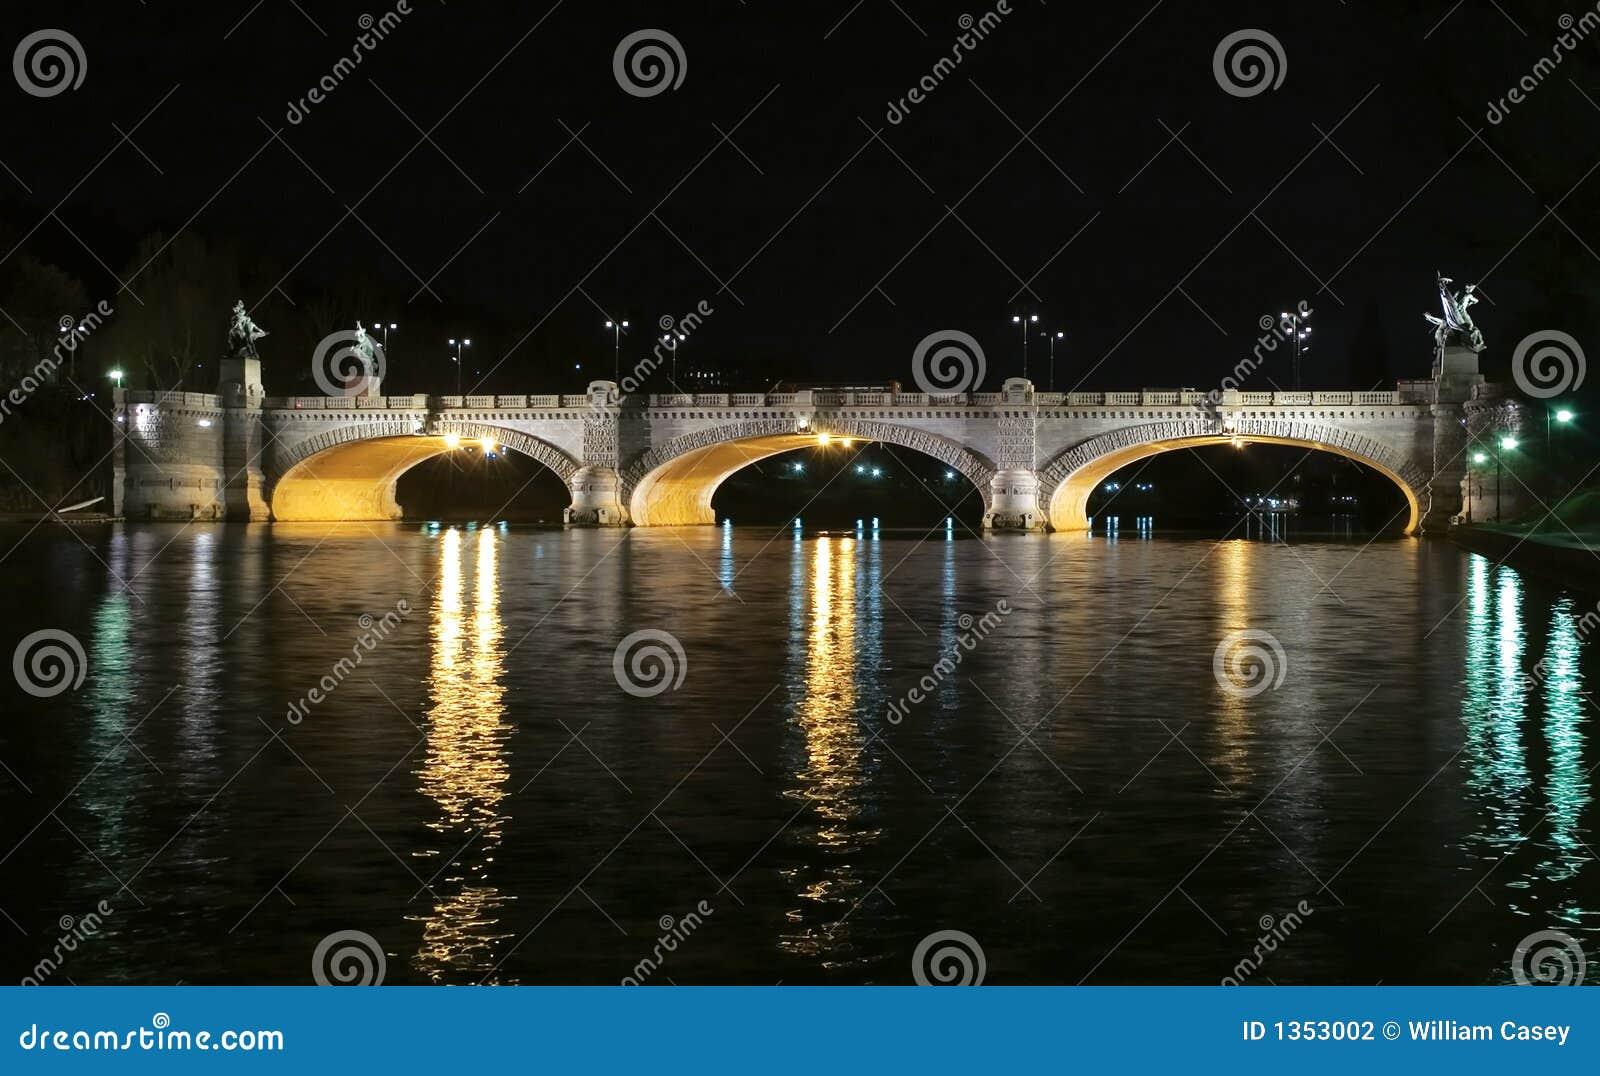 The Umberto Bridge